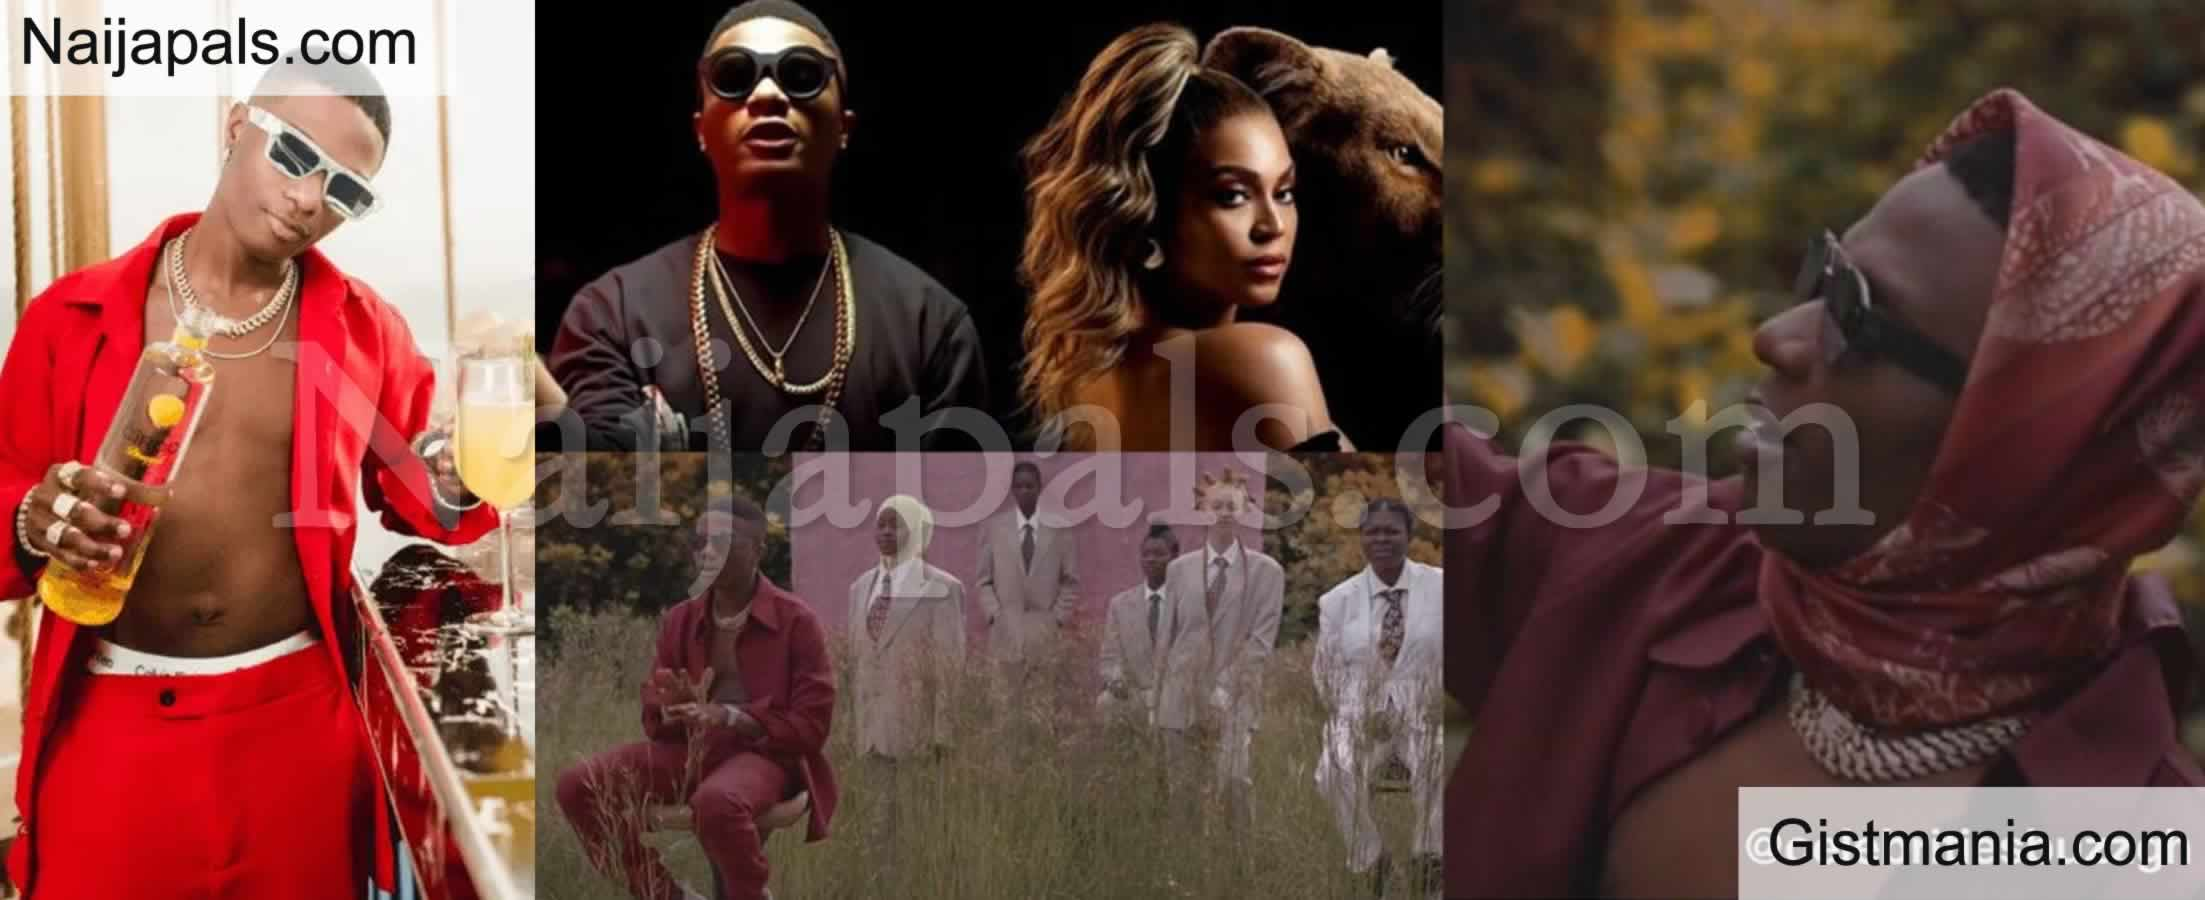 <img alt='.' class='lazyload' data-src='https://img.gistmania.com/emot/award.gif' /> <b>Wizkid & Beyonce's 'Brown Skin Girl' Bags Grammy Nomination For Best Music Video, Fans React</b>